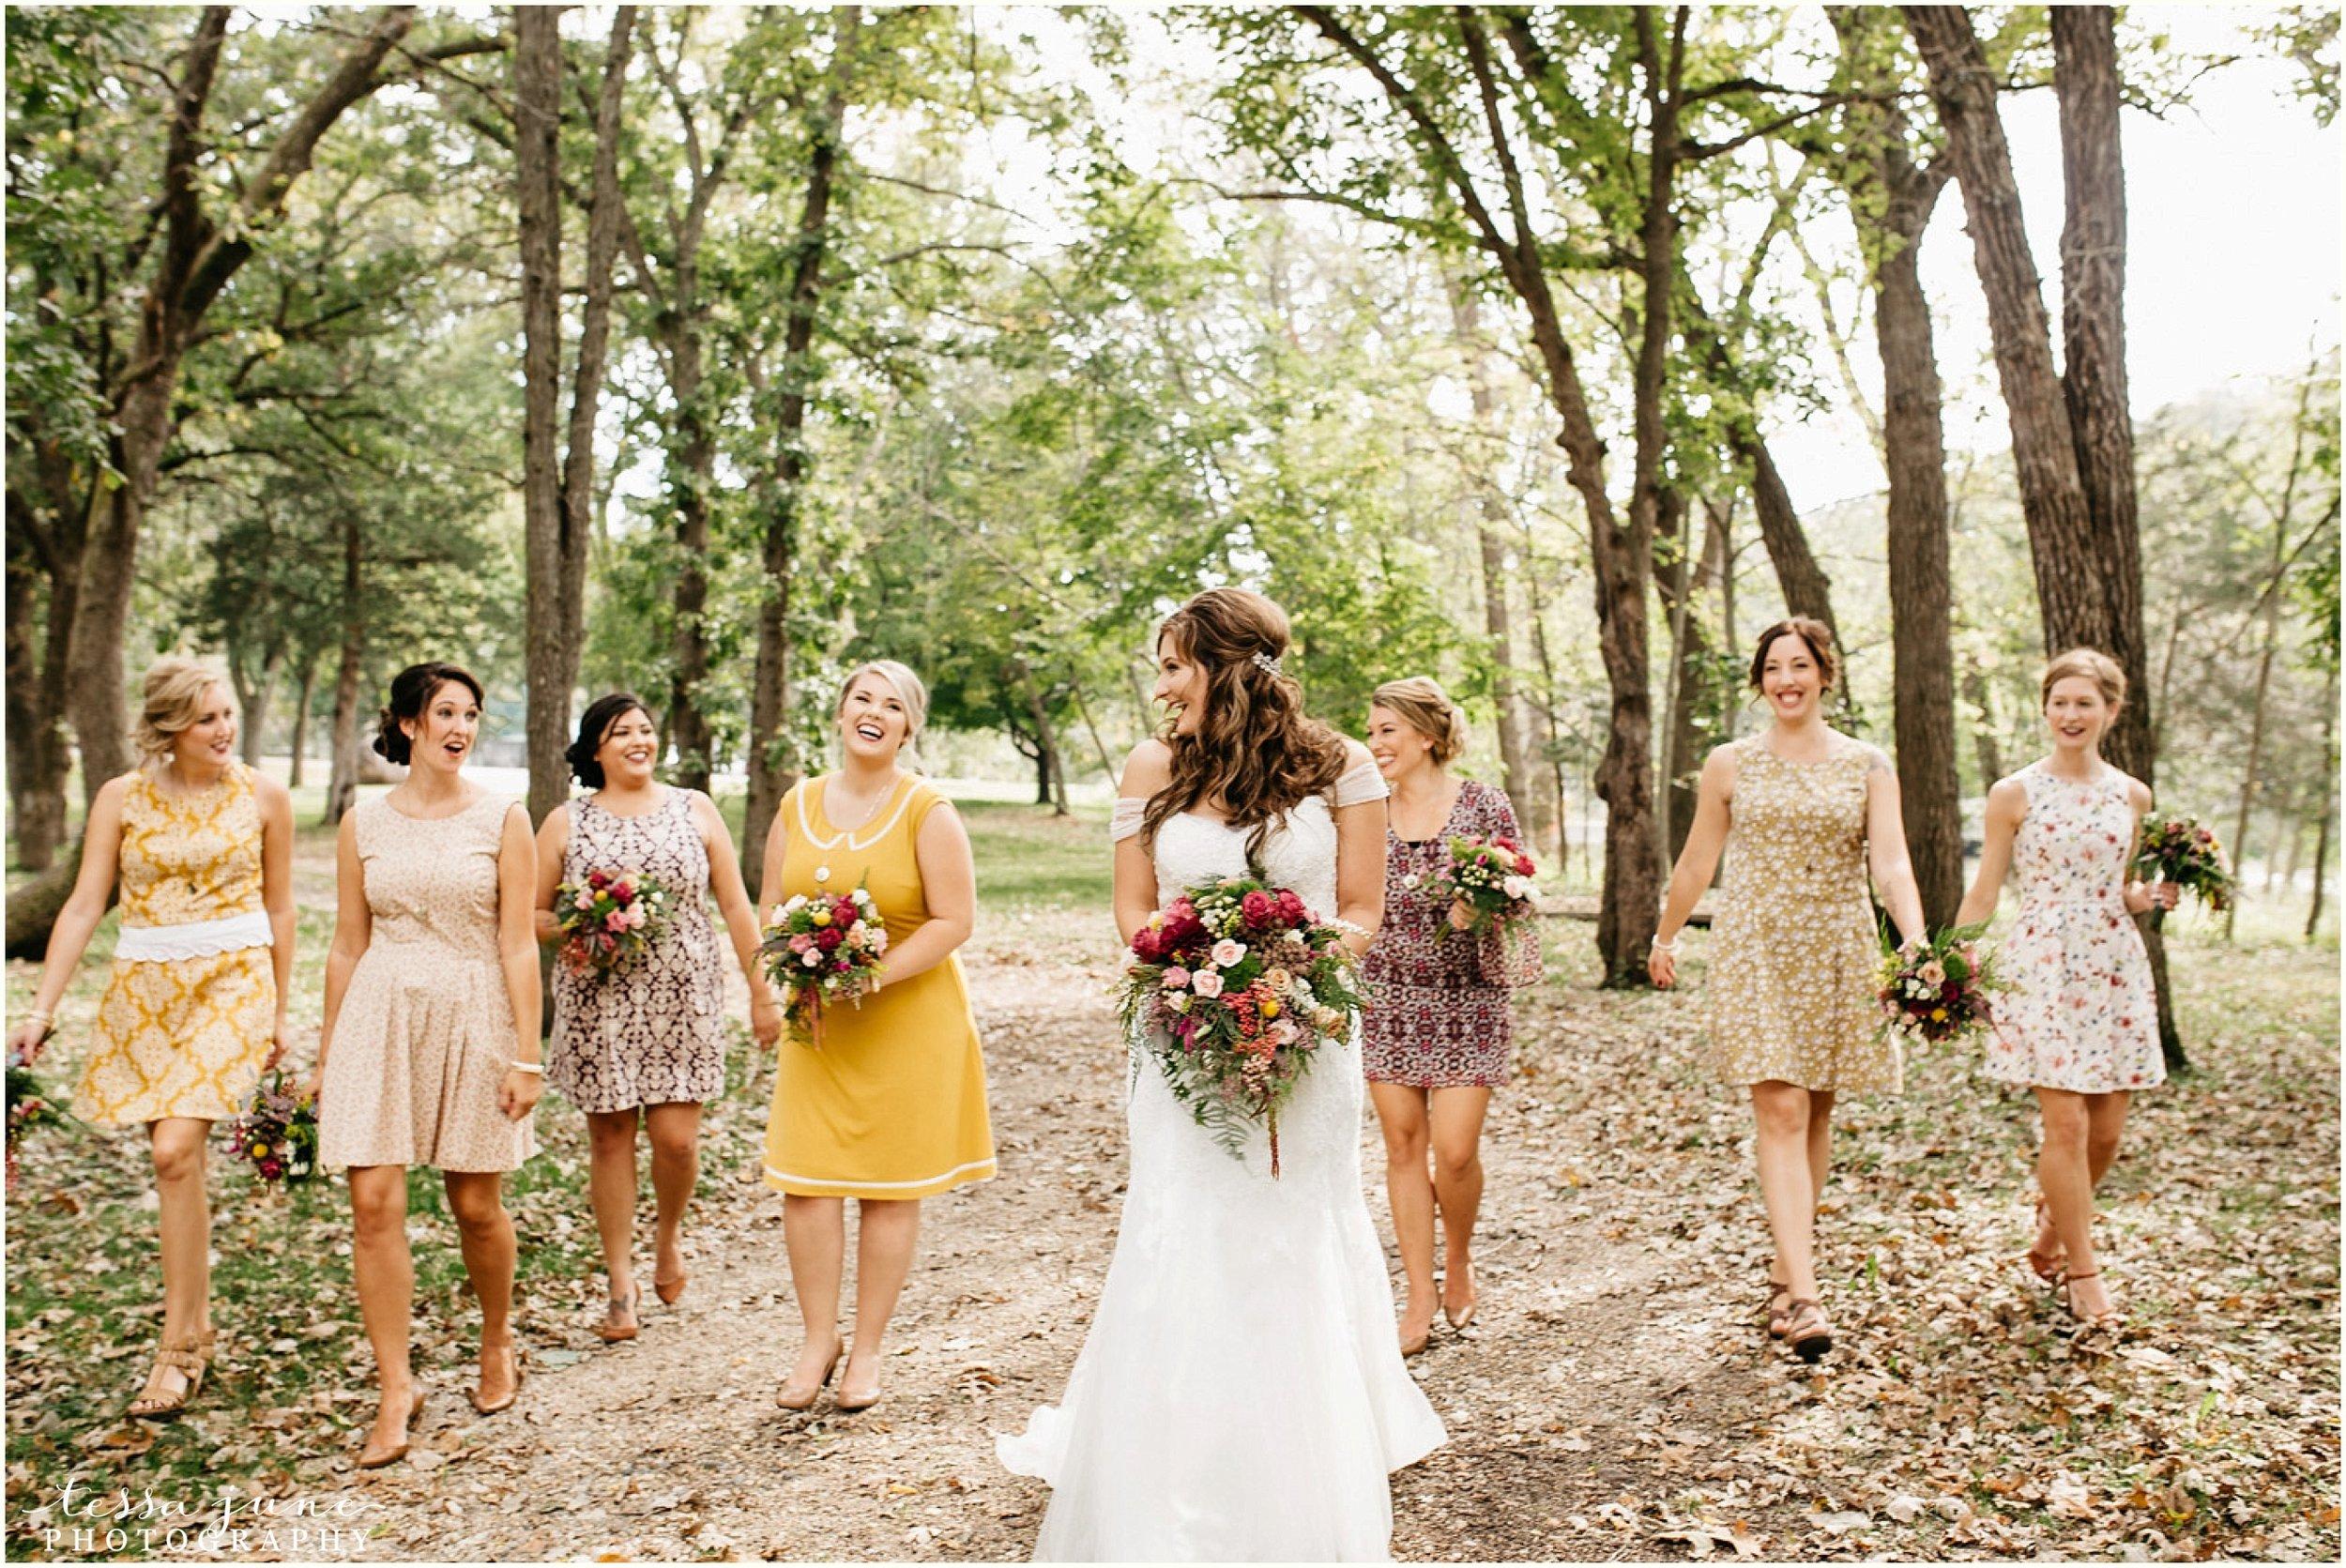 bohemian-minnesota-wedding-mismatched-bridesmaid-dresses-waterfall-st-cloud-tessa-june-photography-77.jpg